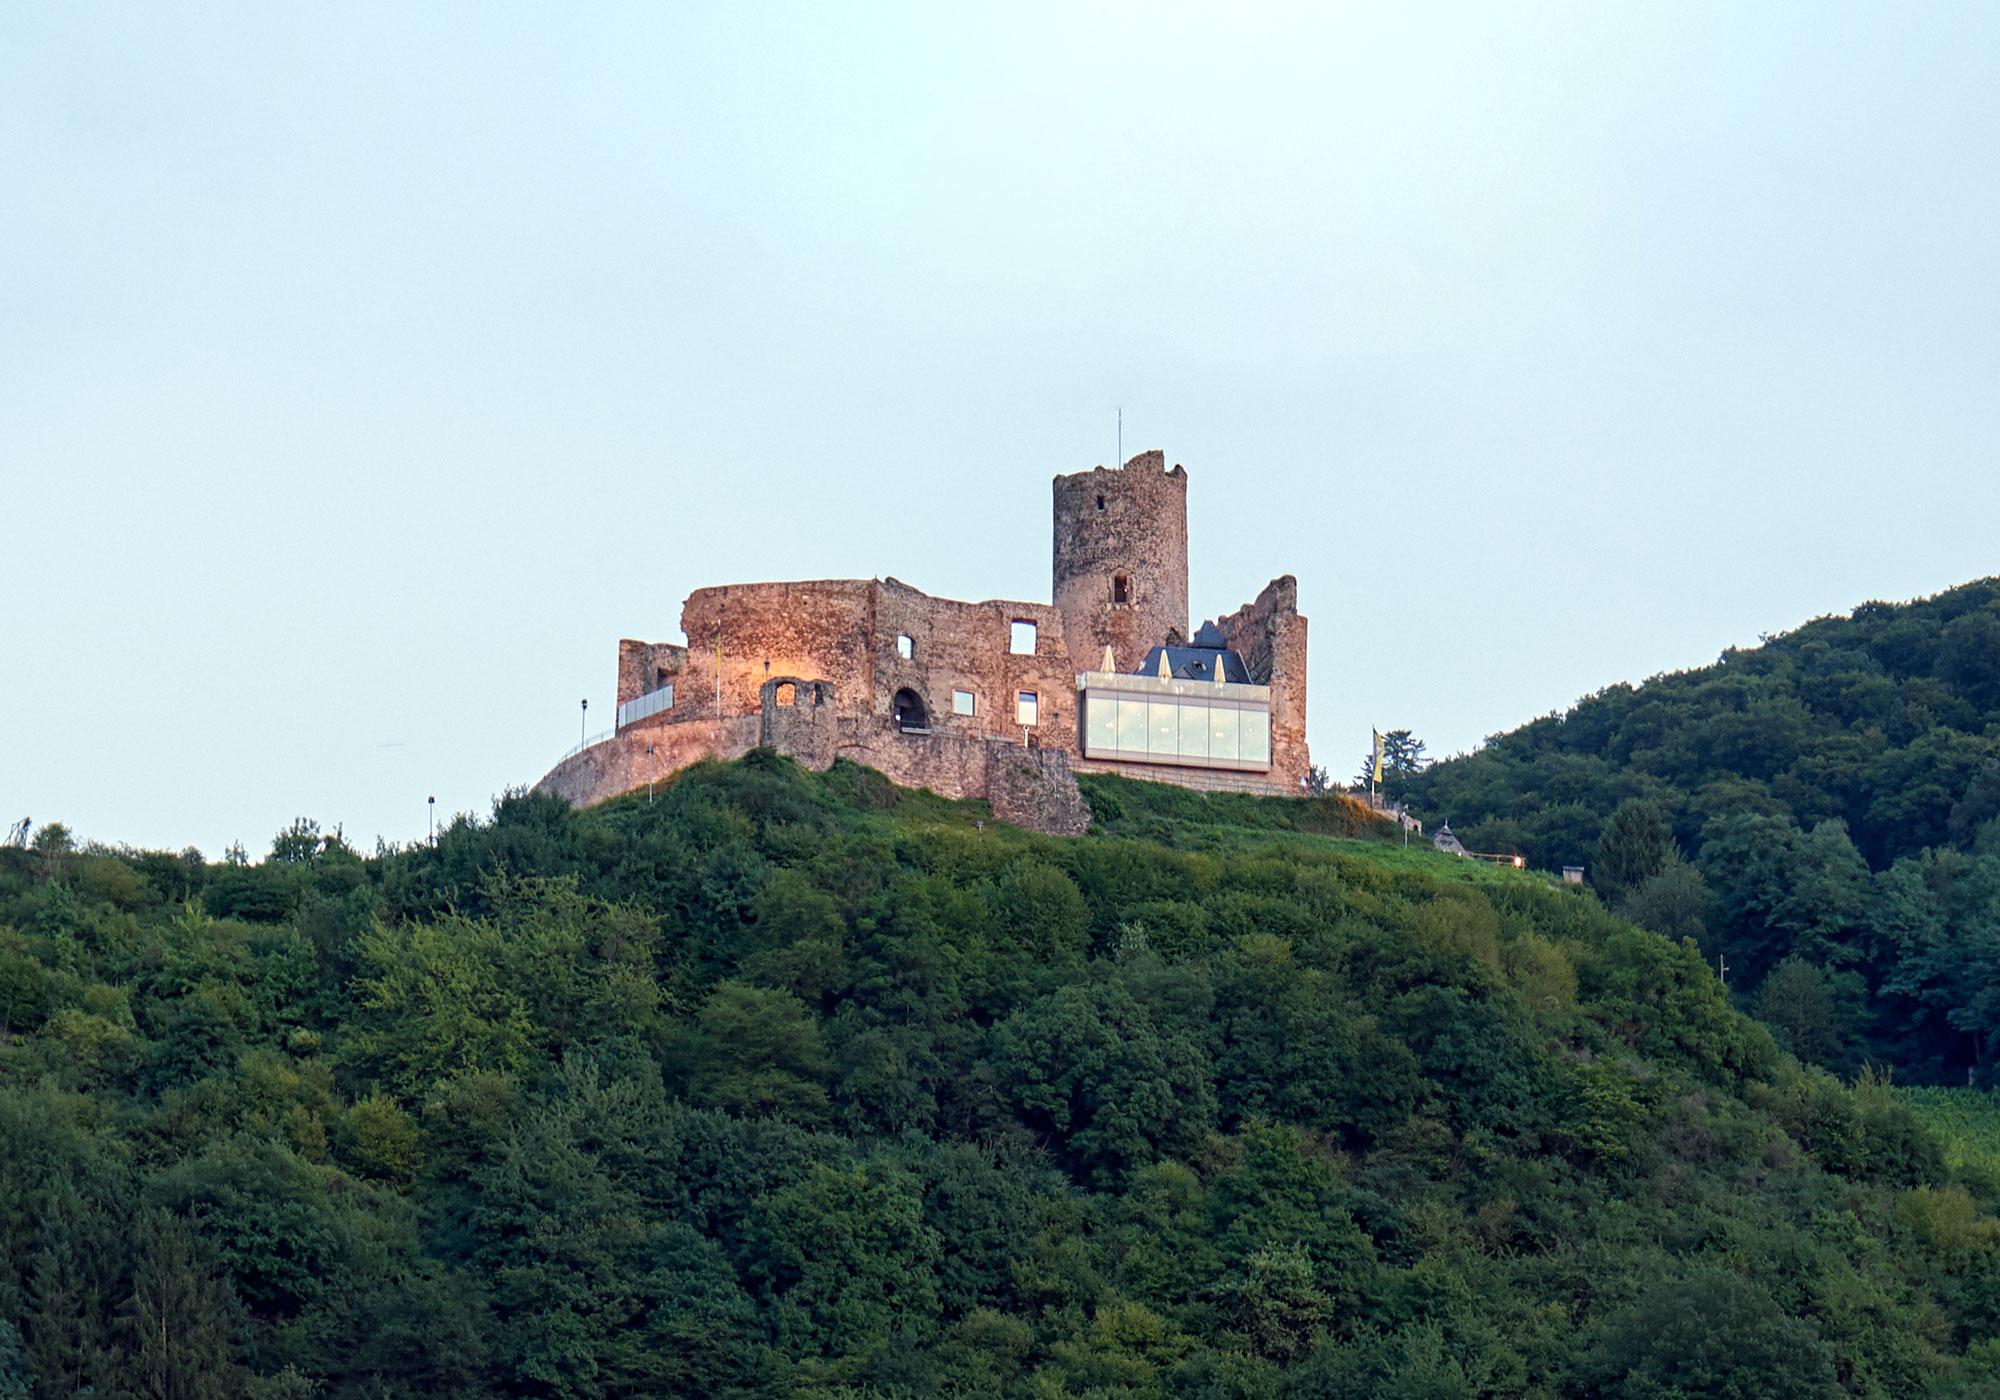 Burg Landshut Bernkastel-Kues bei Tag